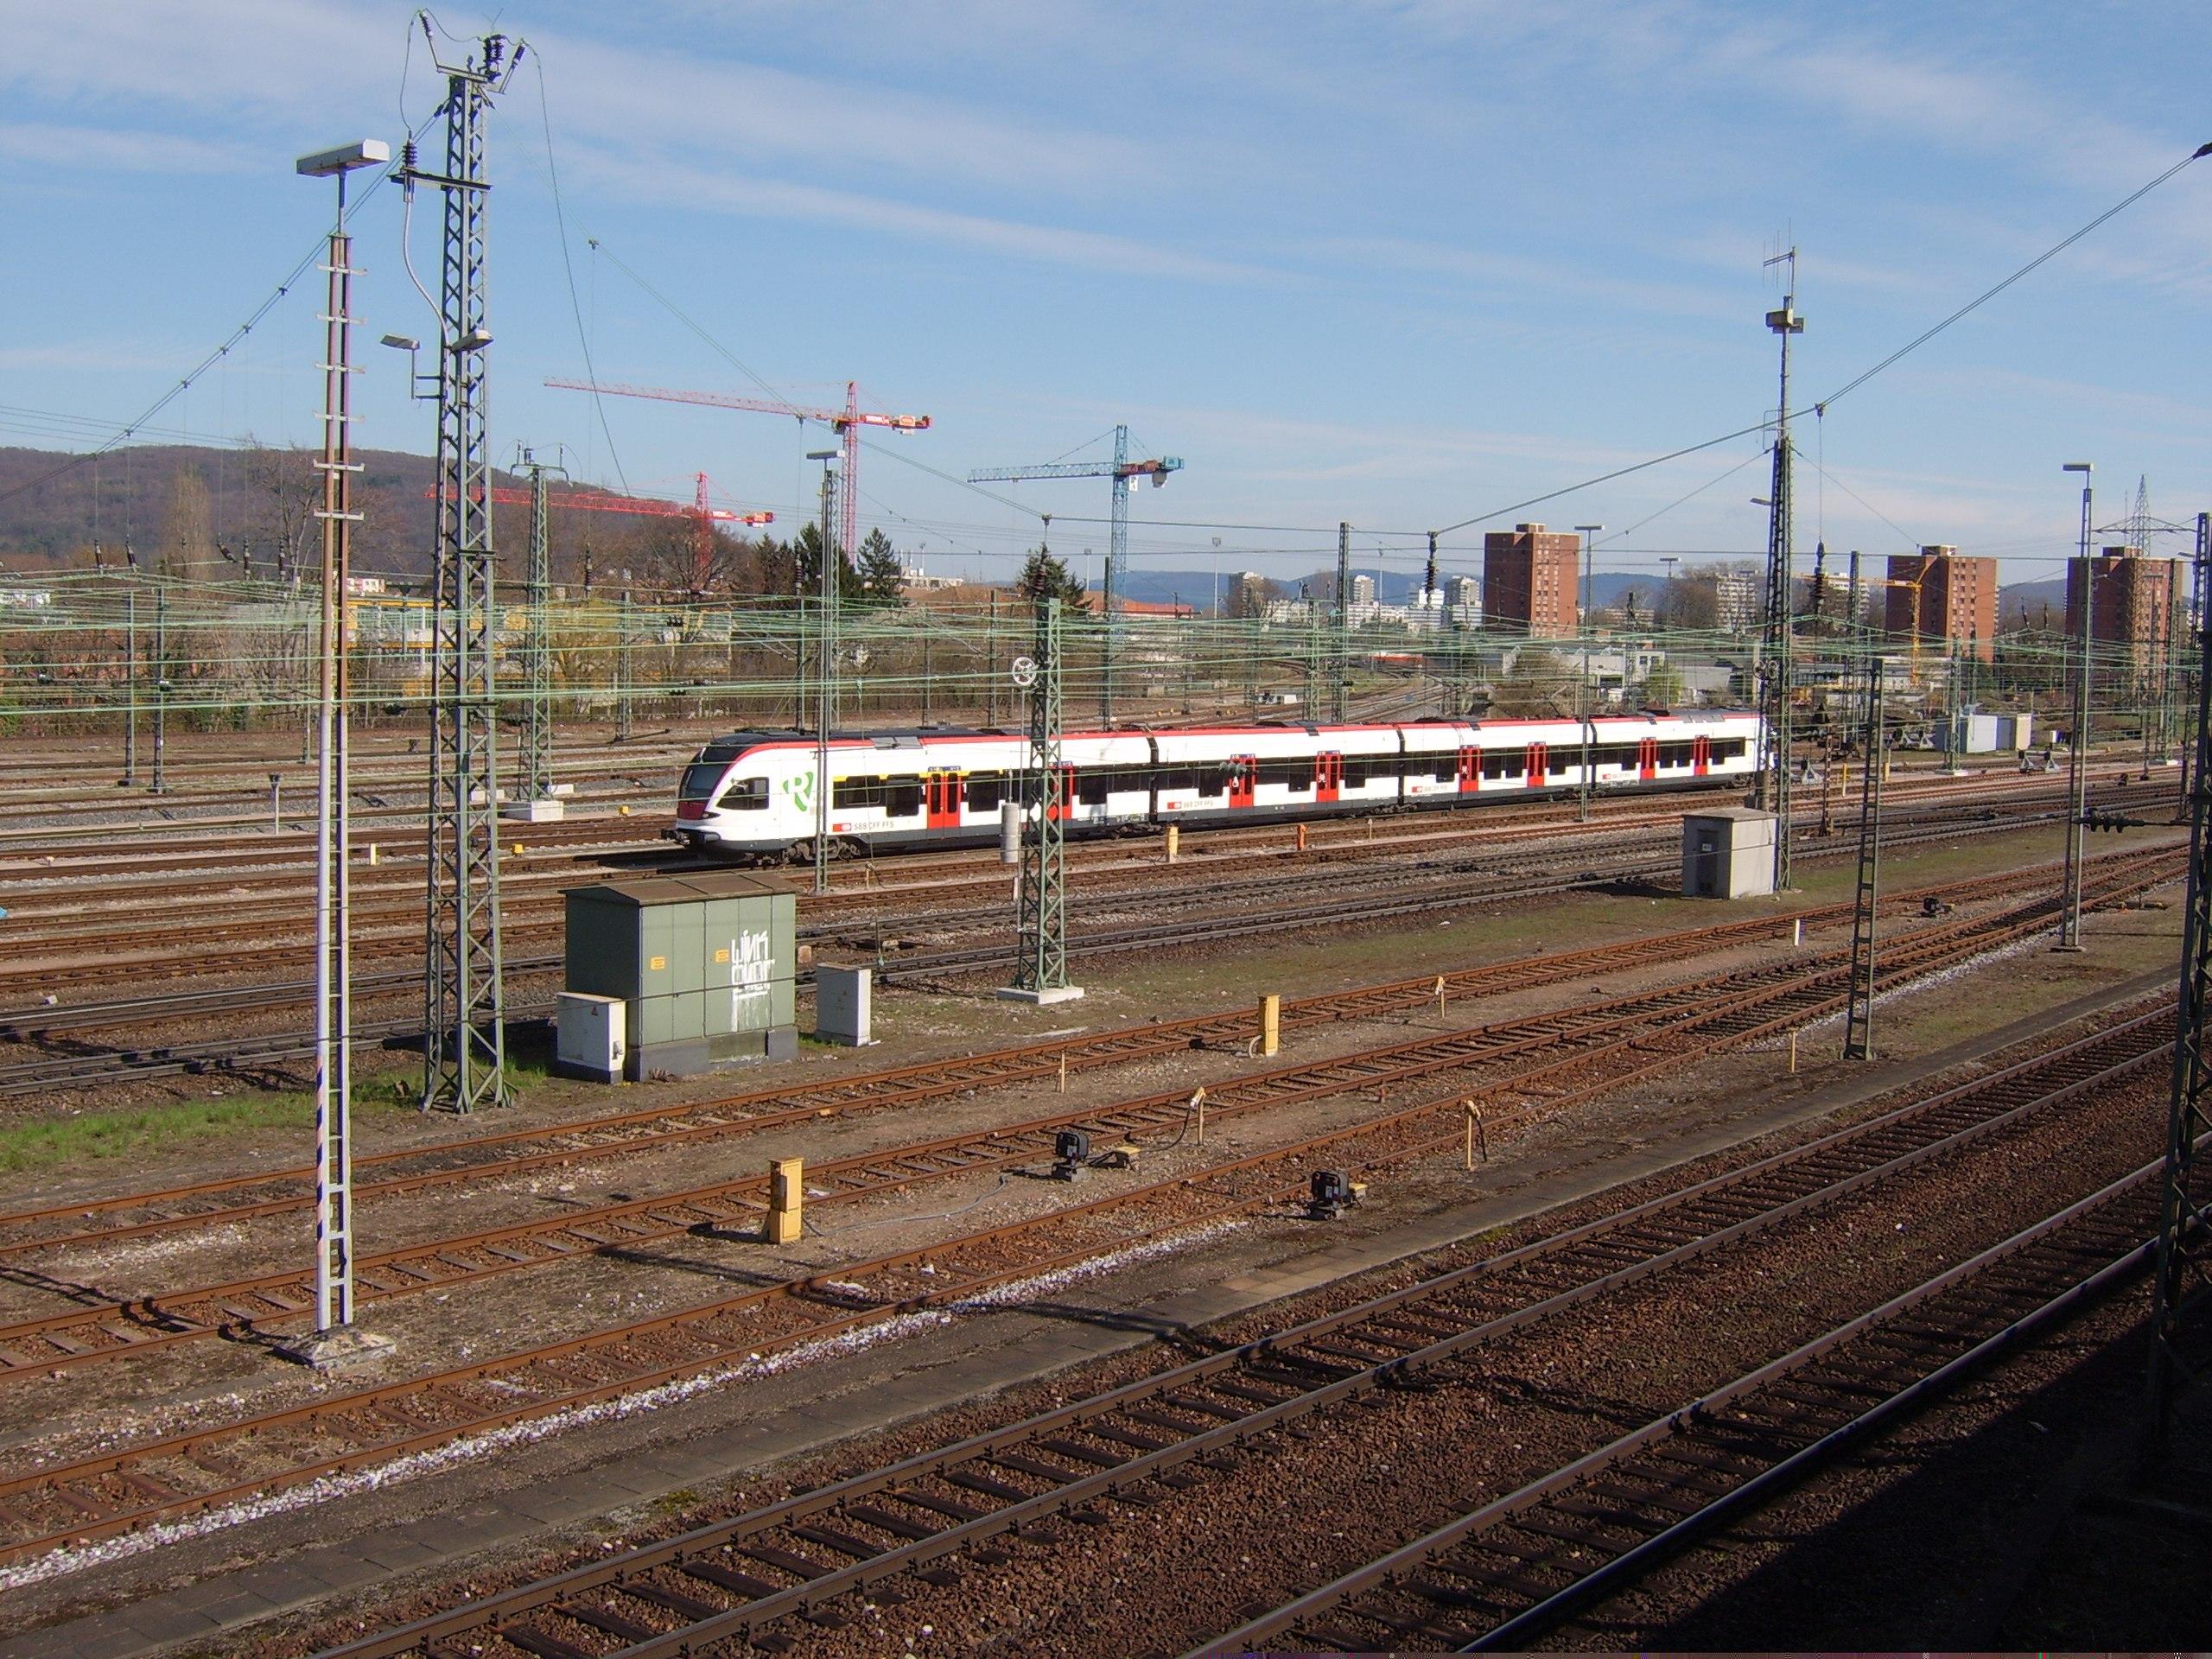 Fájl:Flirt Basel Badischer Bahnhof.jpg